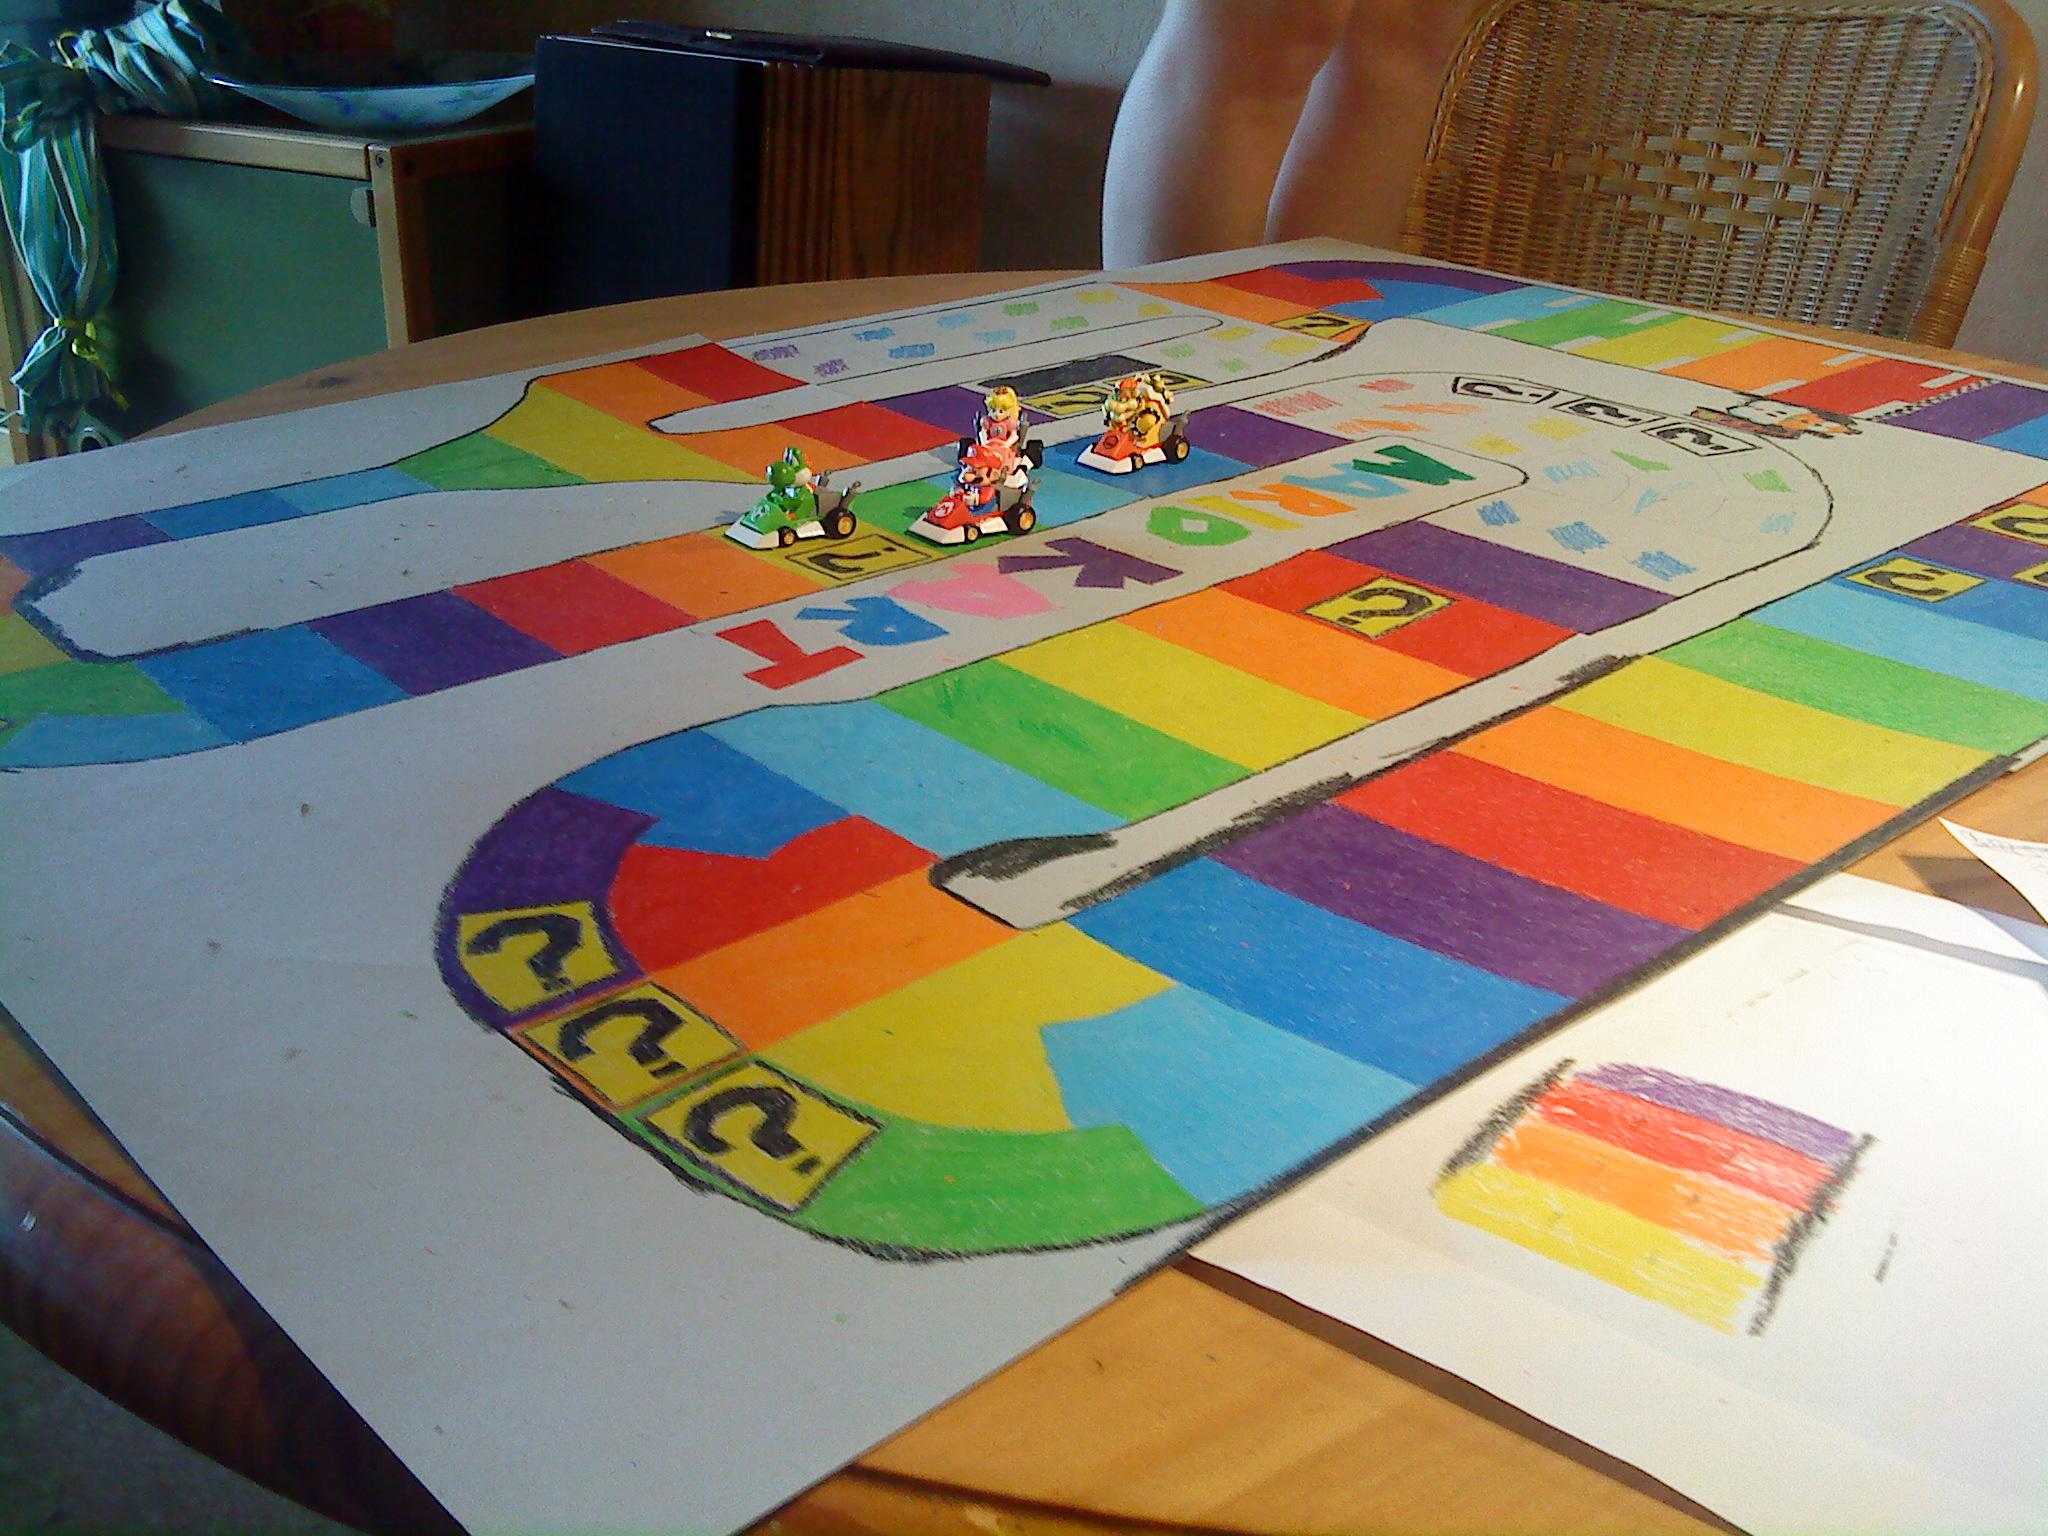 Super Mario Kart – Brettspiel (Boardgame) | KIRBYTHOUGTHS